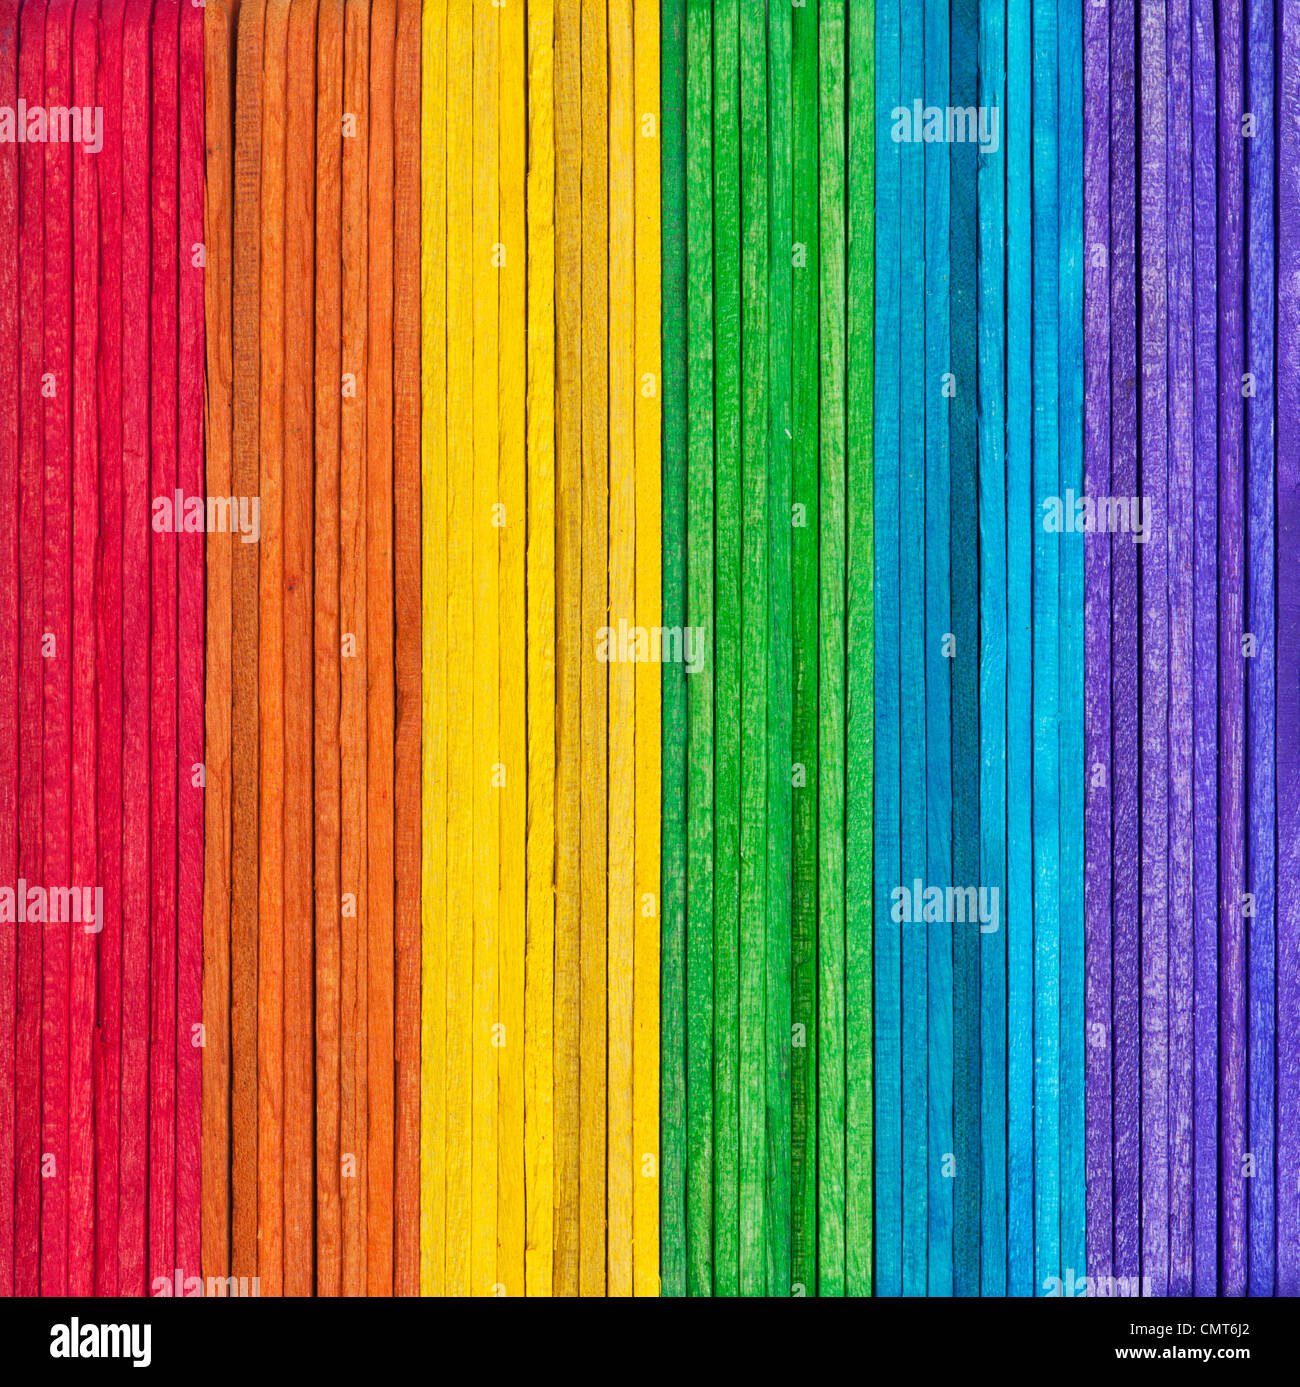 Multicoloured rainbow stick patternbri - Stock Image